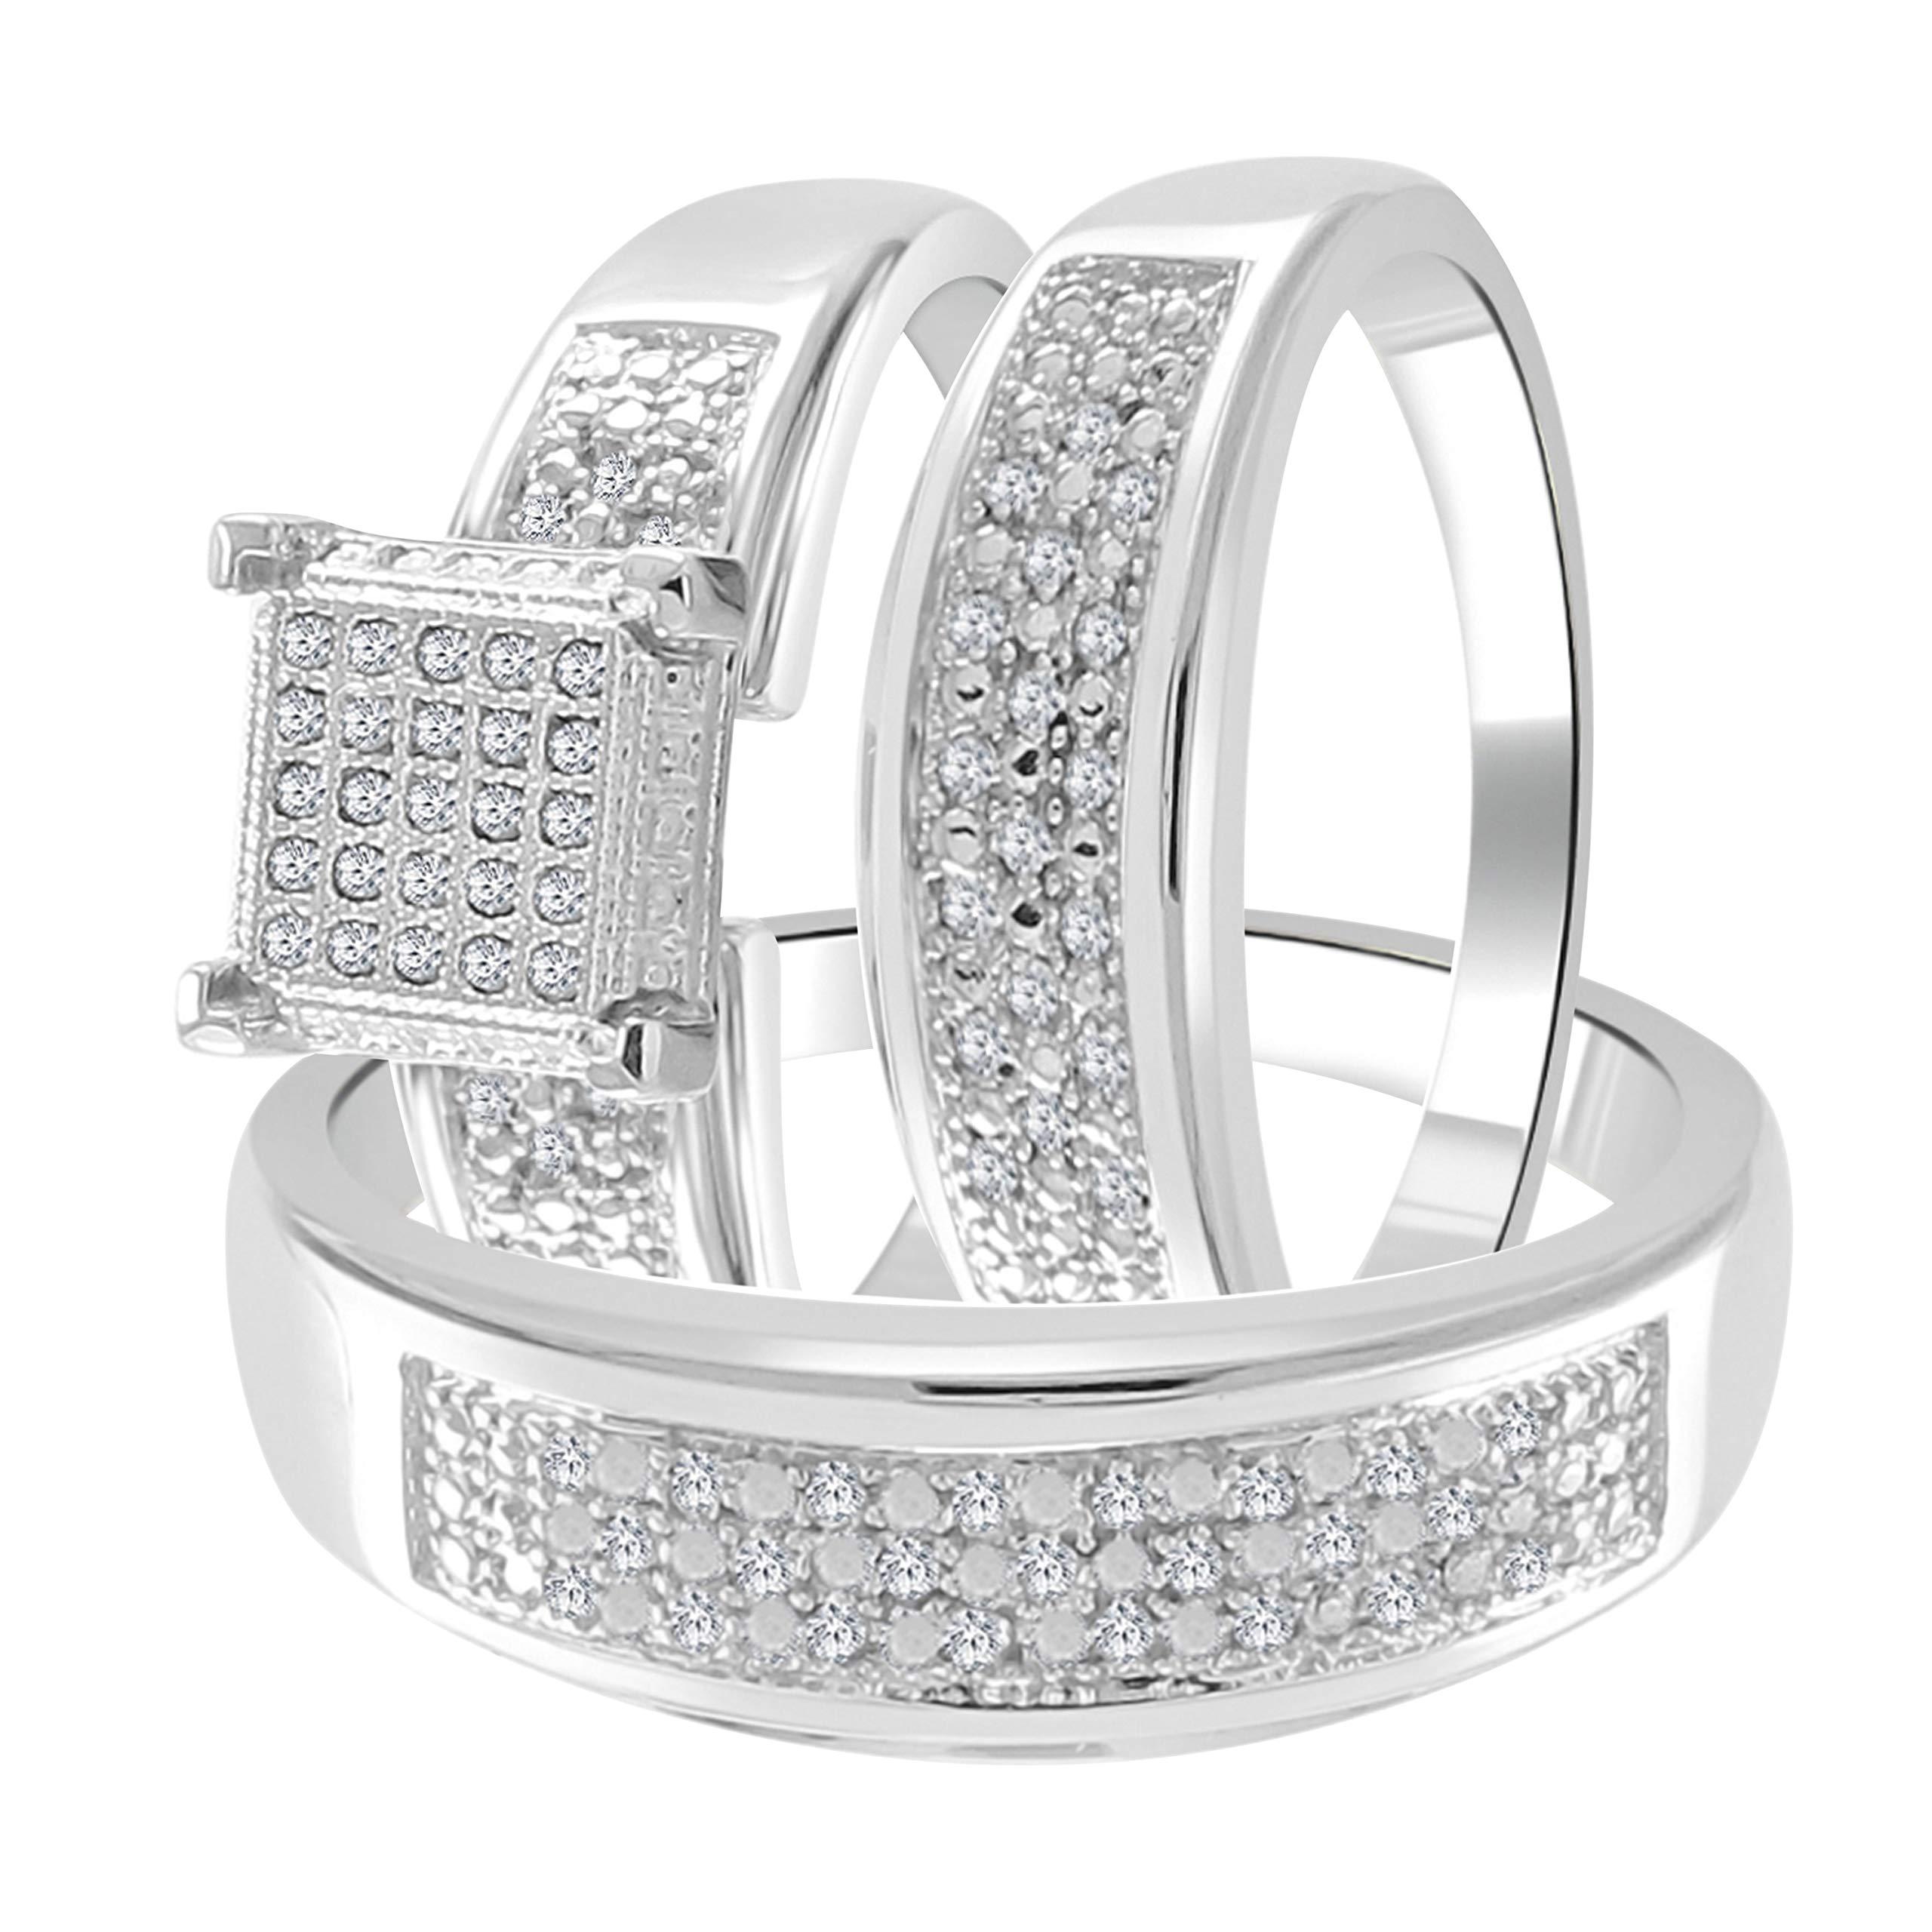 Trillion Jewels 0.23ct Natural Diamond (Clarity I2-I3/Colour I-J) S925 Trio Wedding Band Engagement Ring Set Him 10/ Her 7